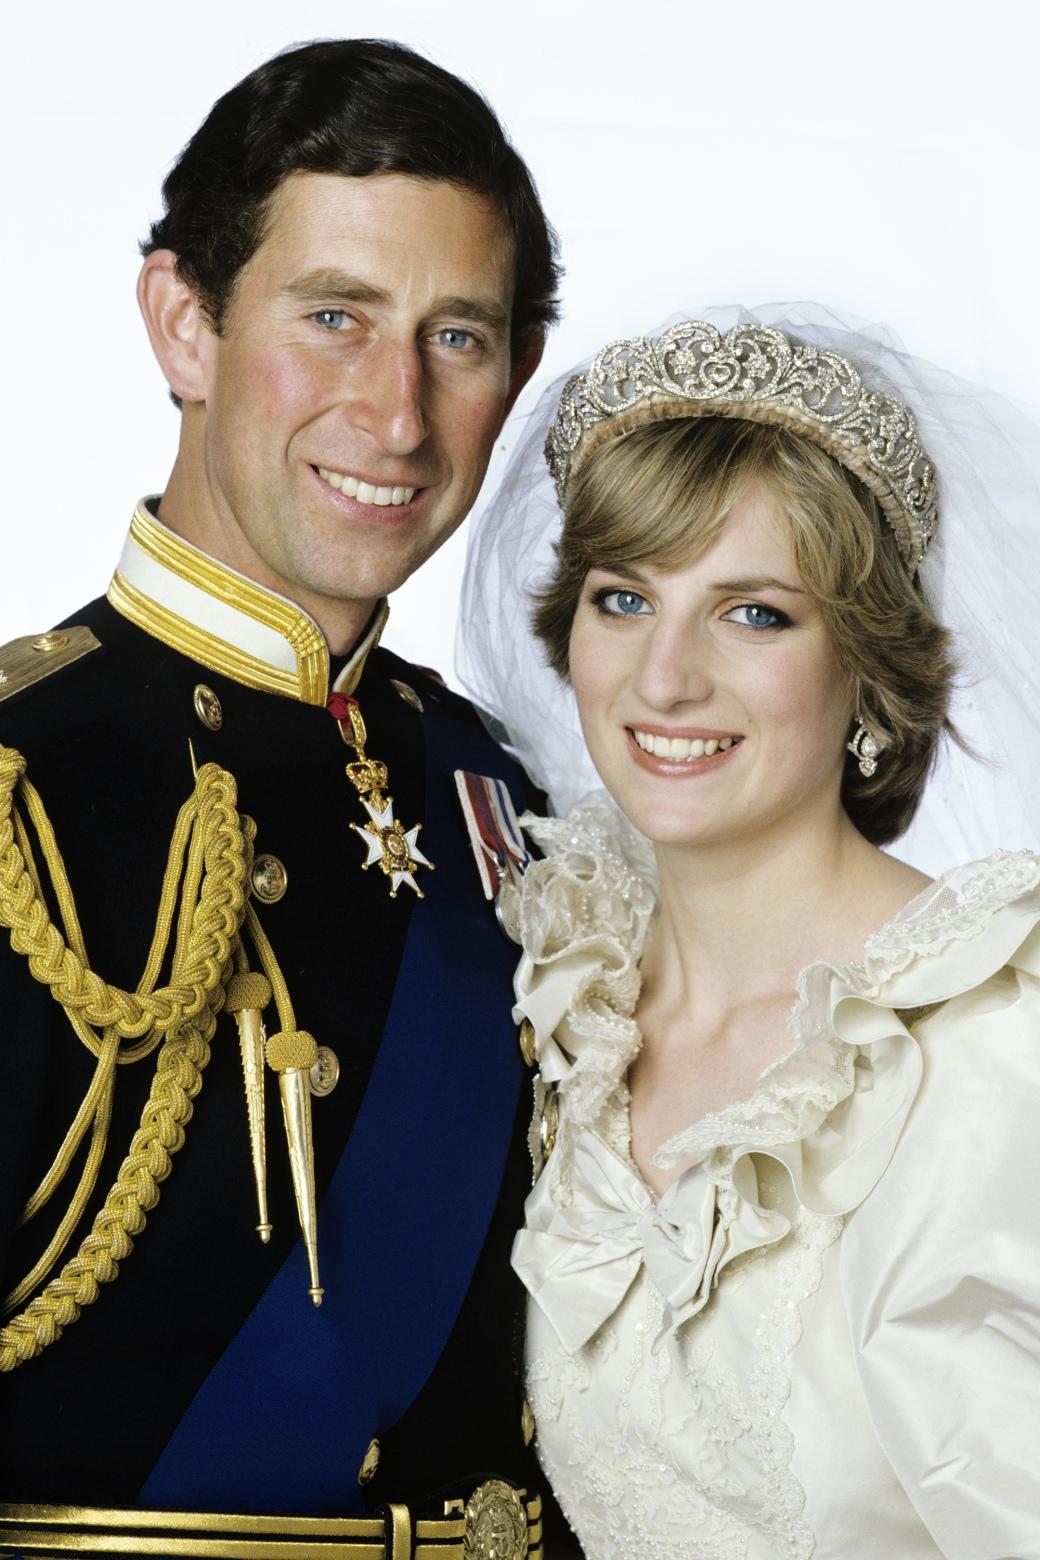 1438193156-hbz-princess-diana-prince-charles-wedding-77413370